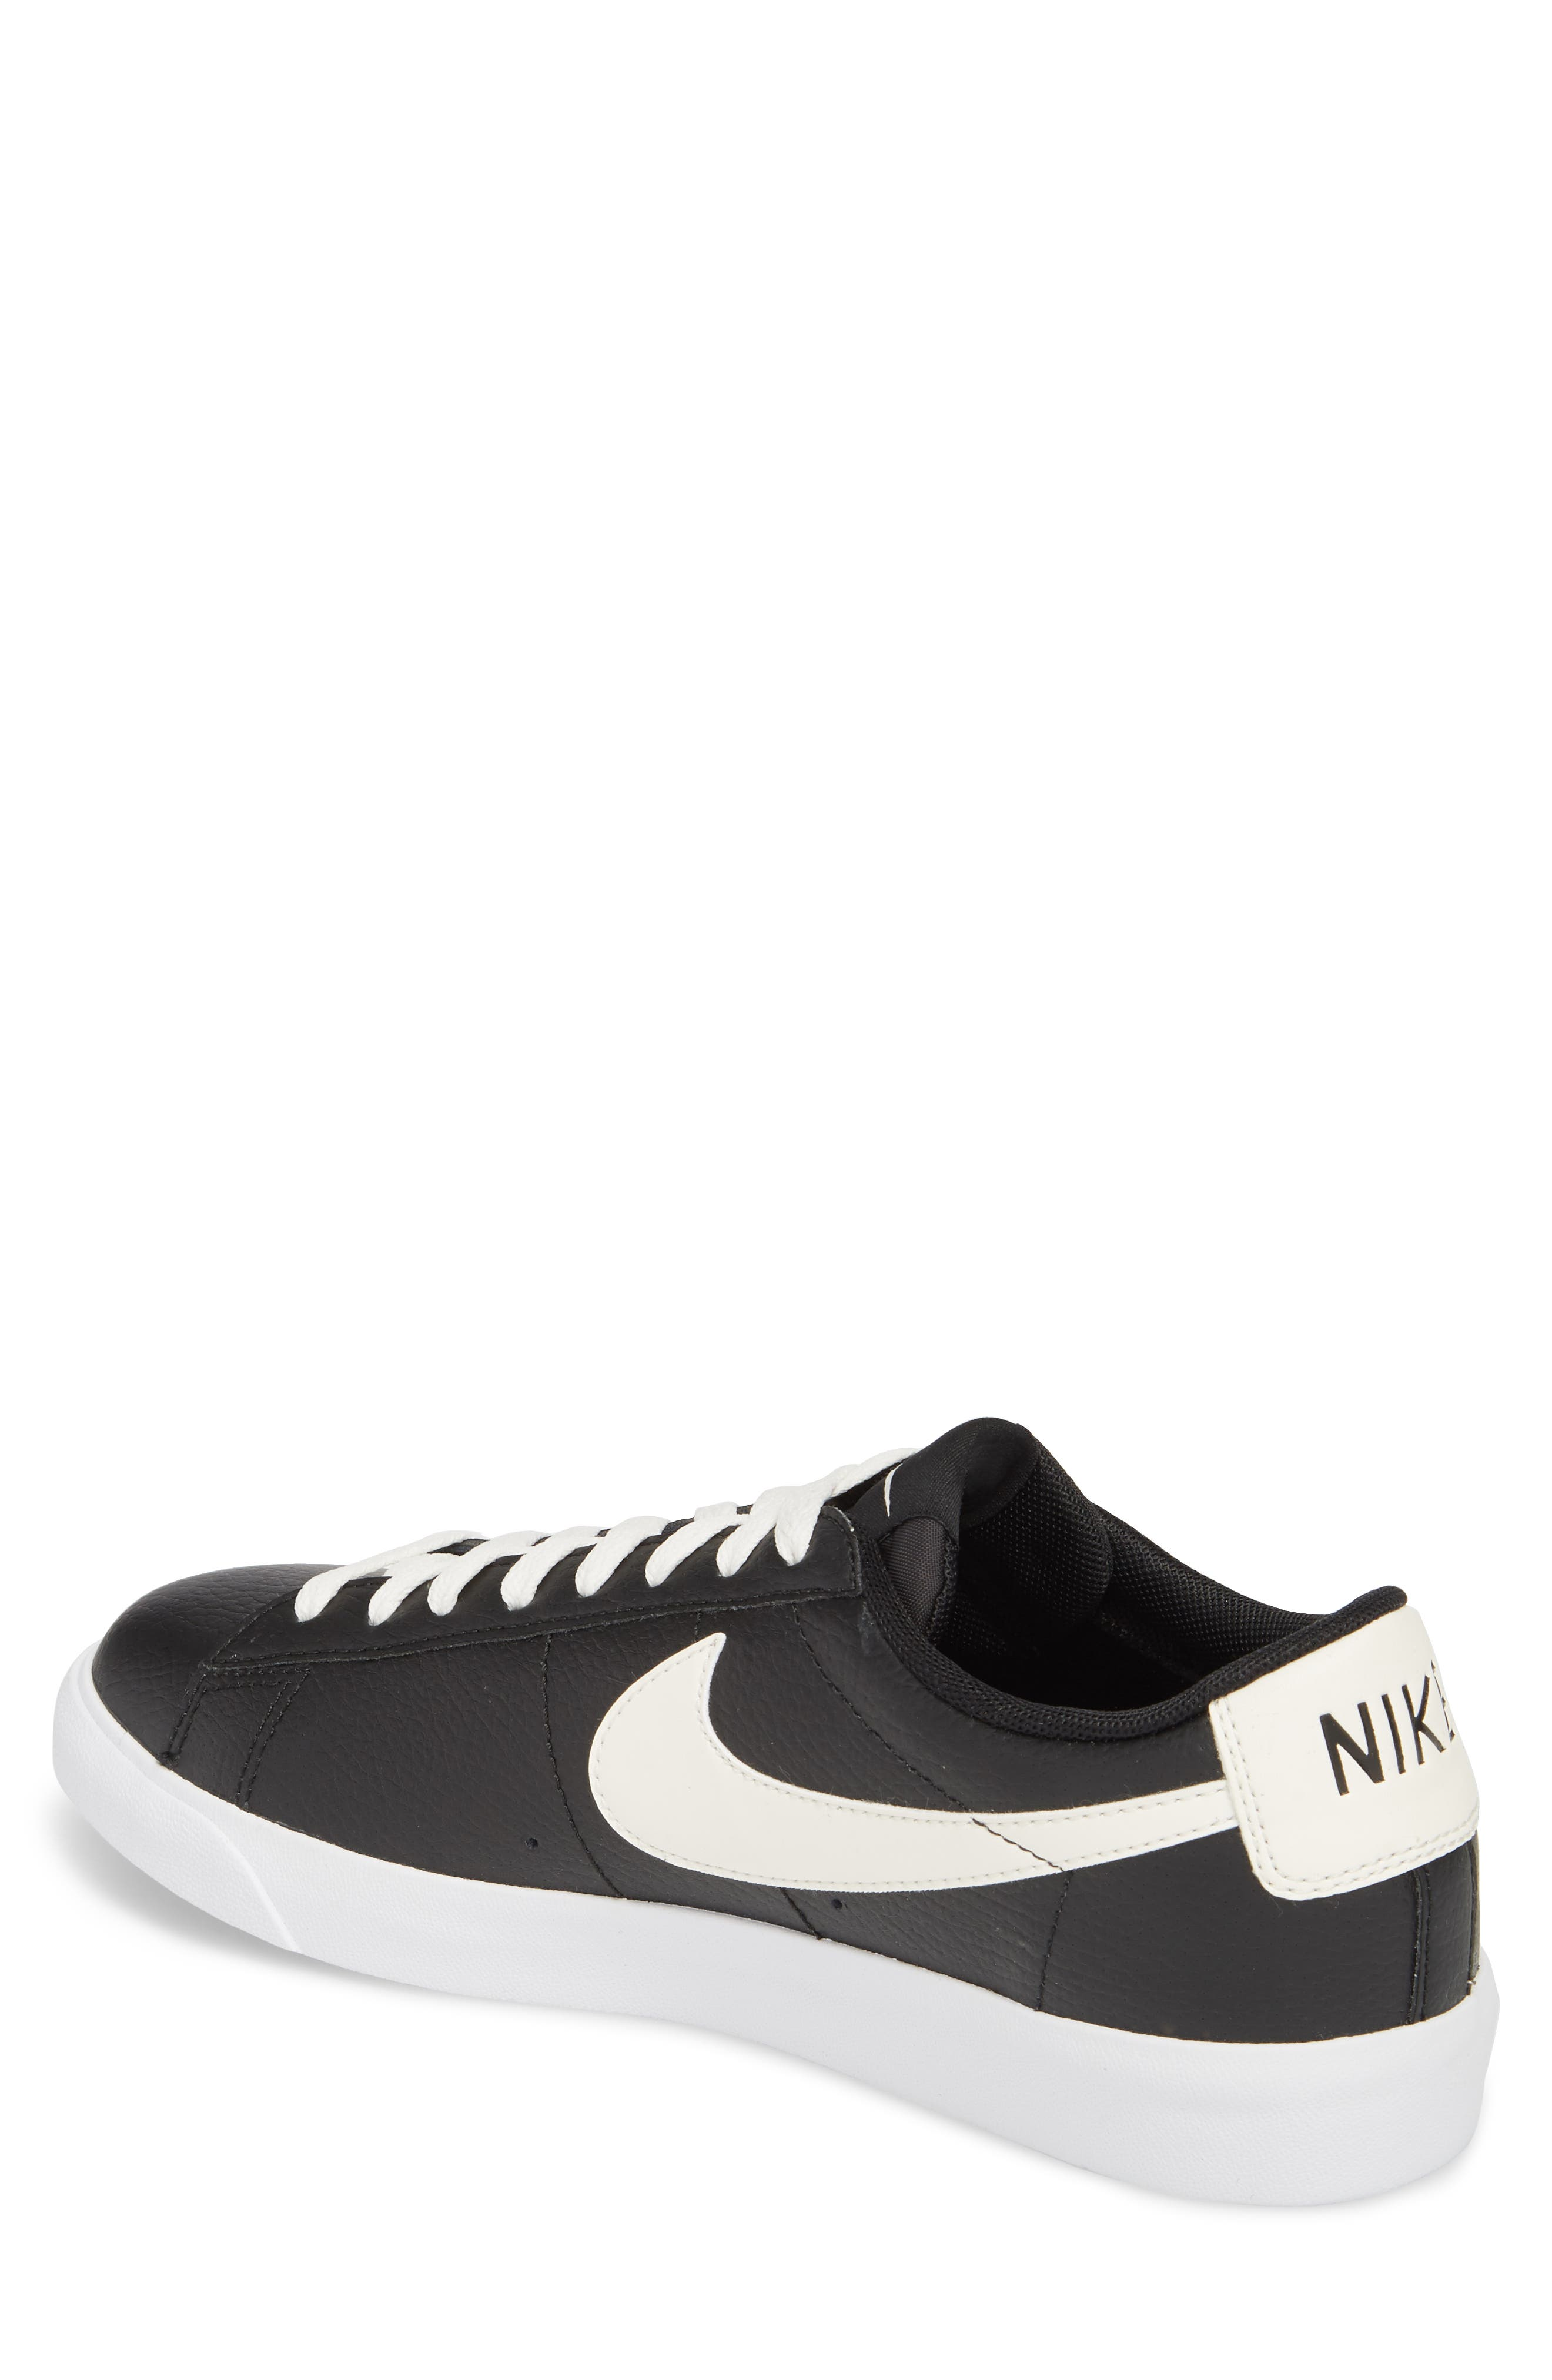 Blazer Low Leather Sneaker,                             Alternate thumbnail 2, color,